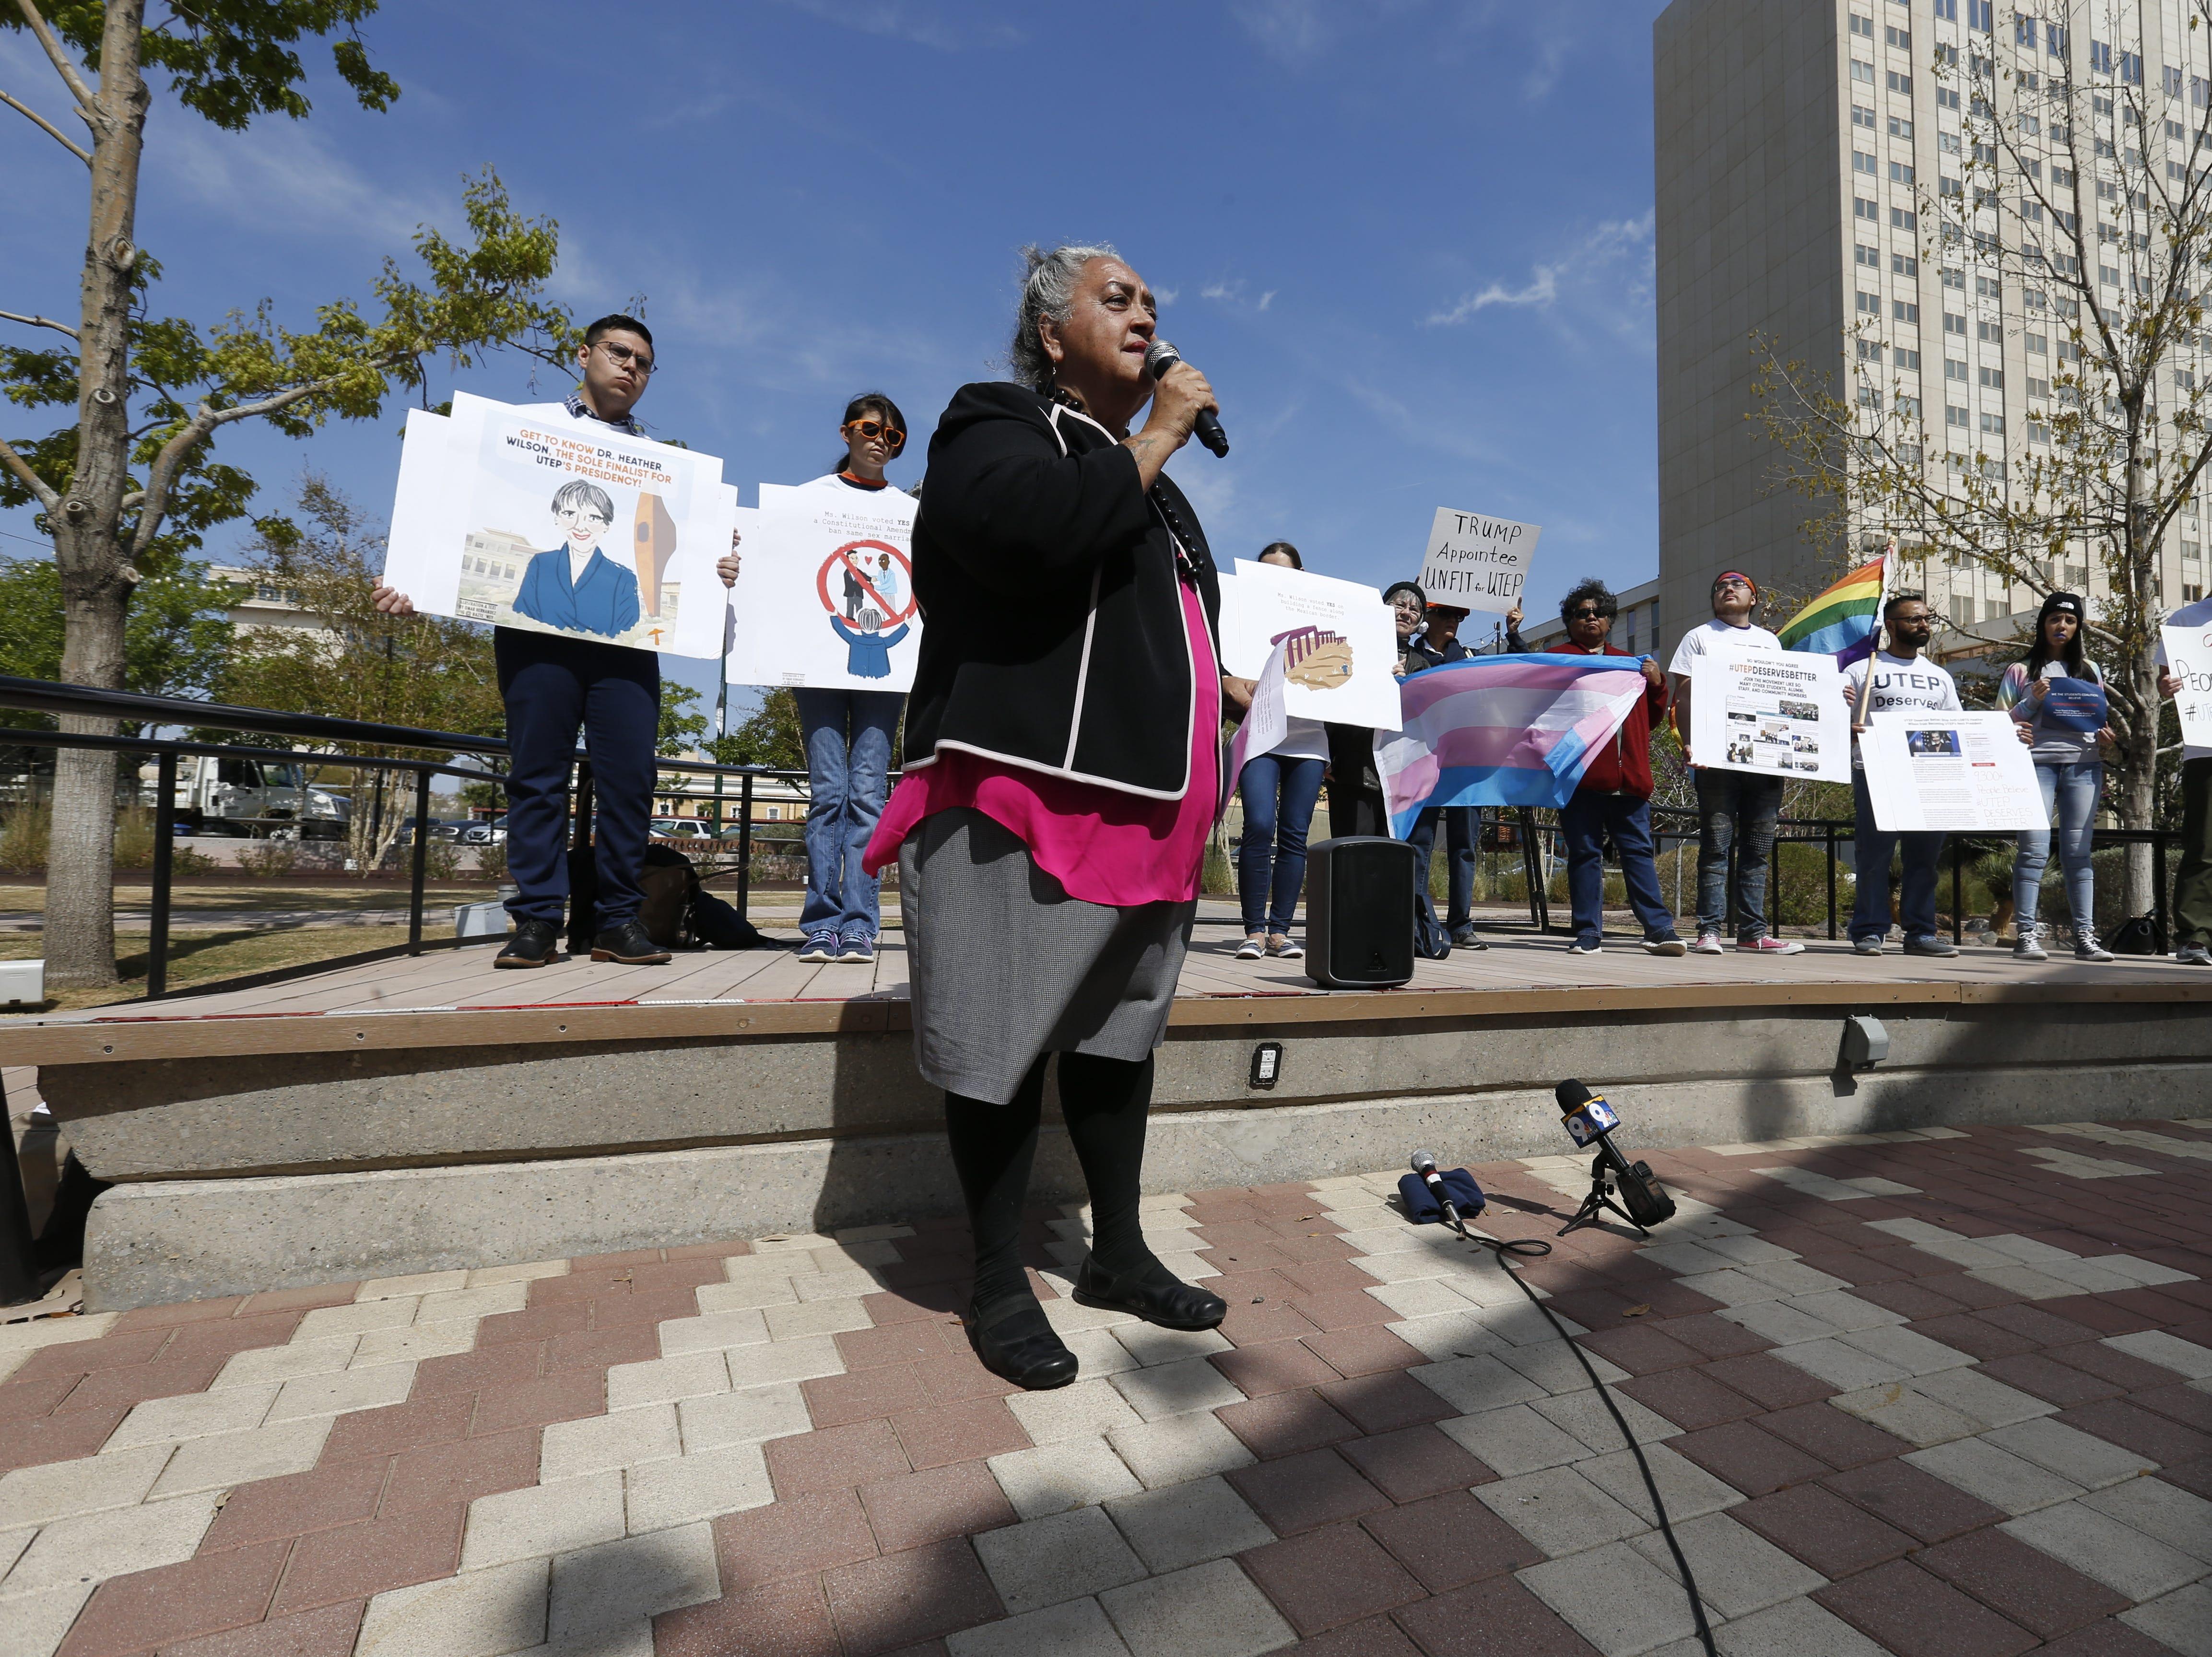 Yolanda Chavez Leyva, an associate professor at UTEP, calls for UT regents to reconsider decision to appoint Heather Wilson as President of UTEP.